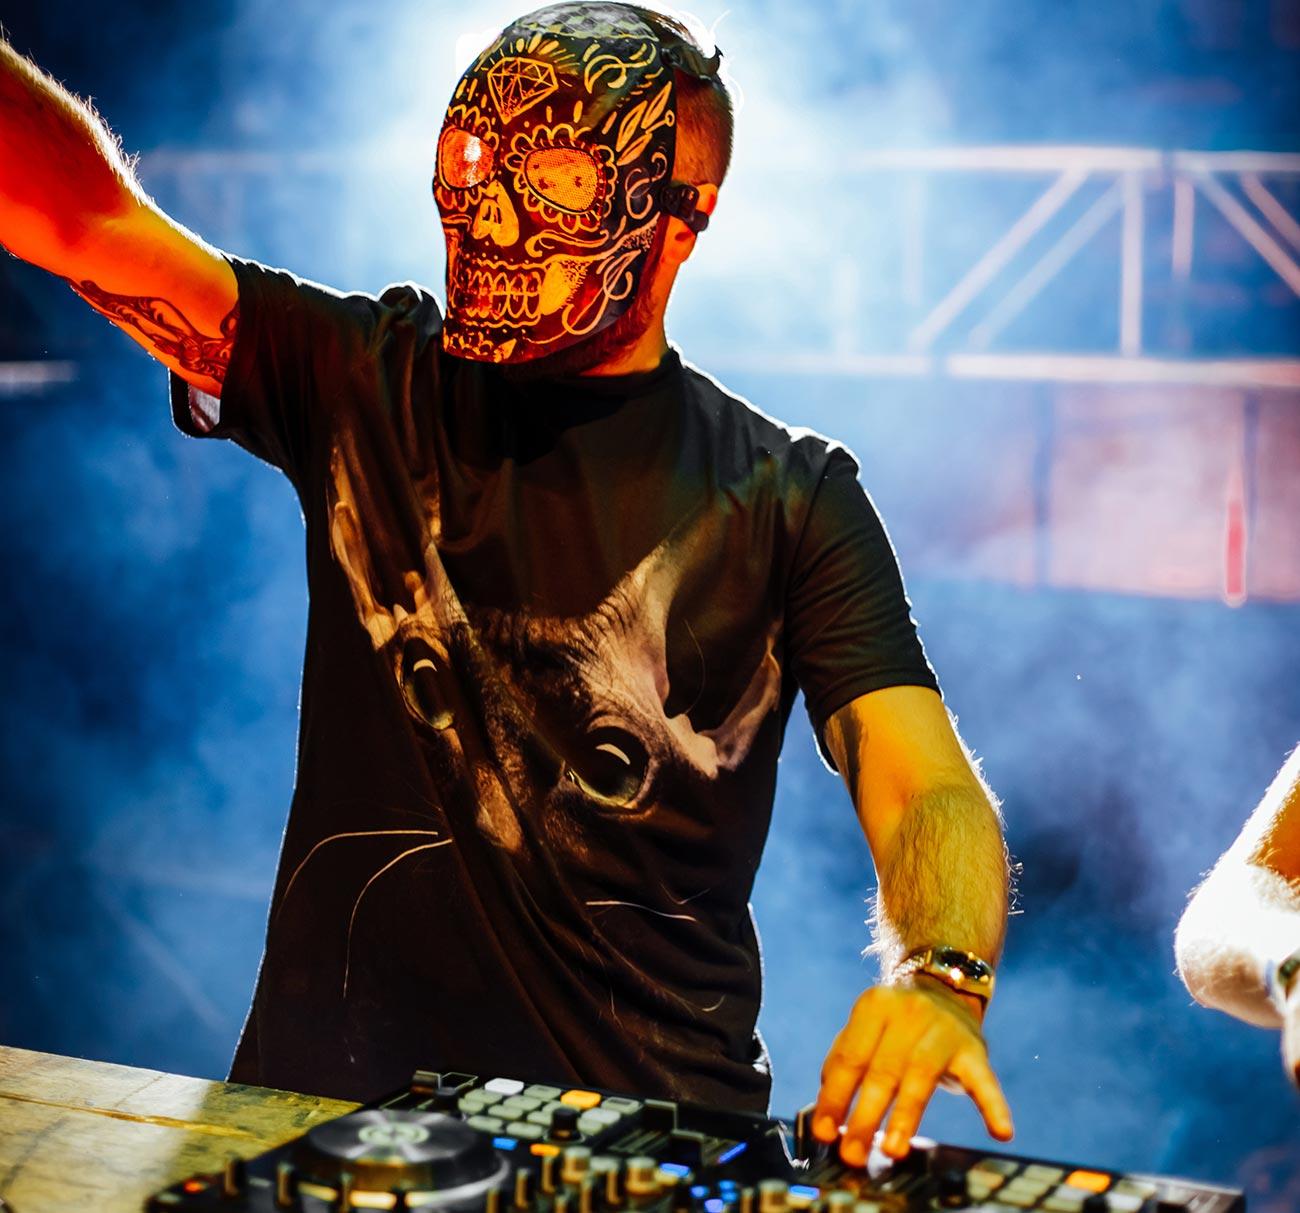 Masked DJ